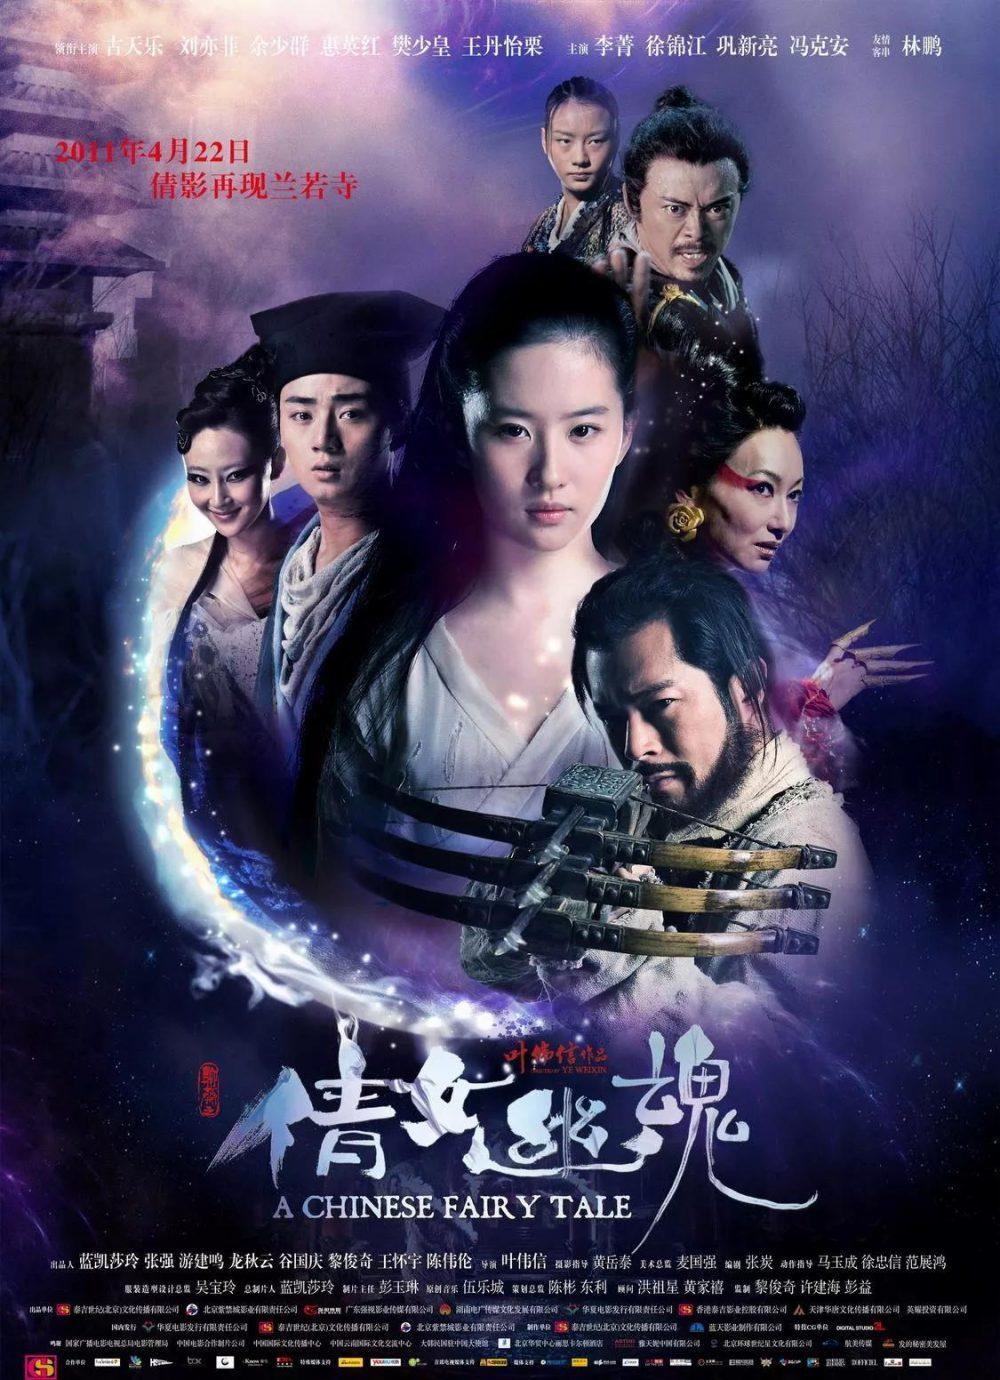 Thiện nữ u hồn - A Chinese Ghost Story (2010)